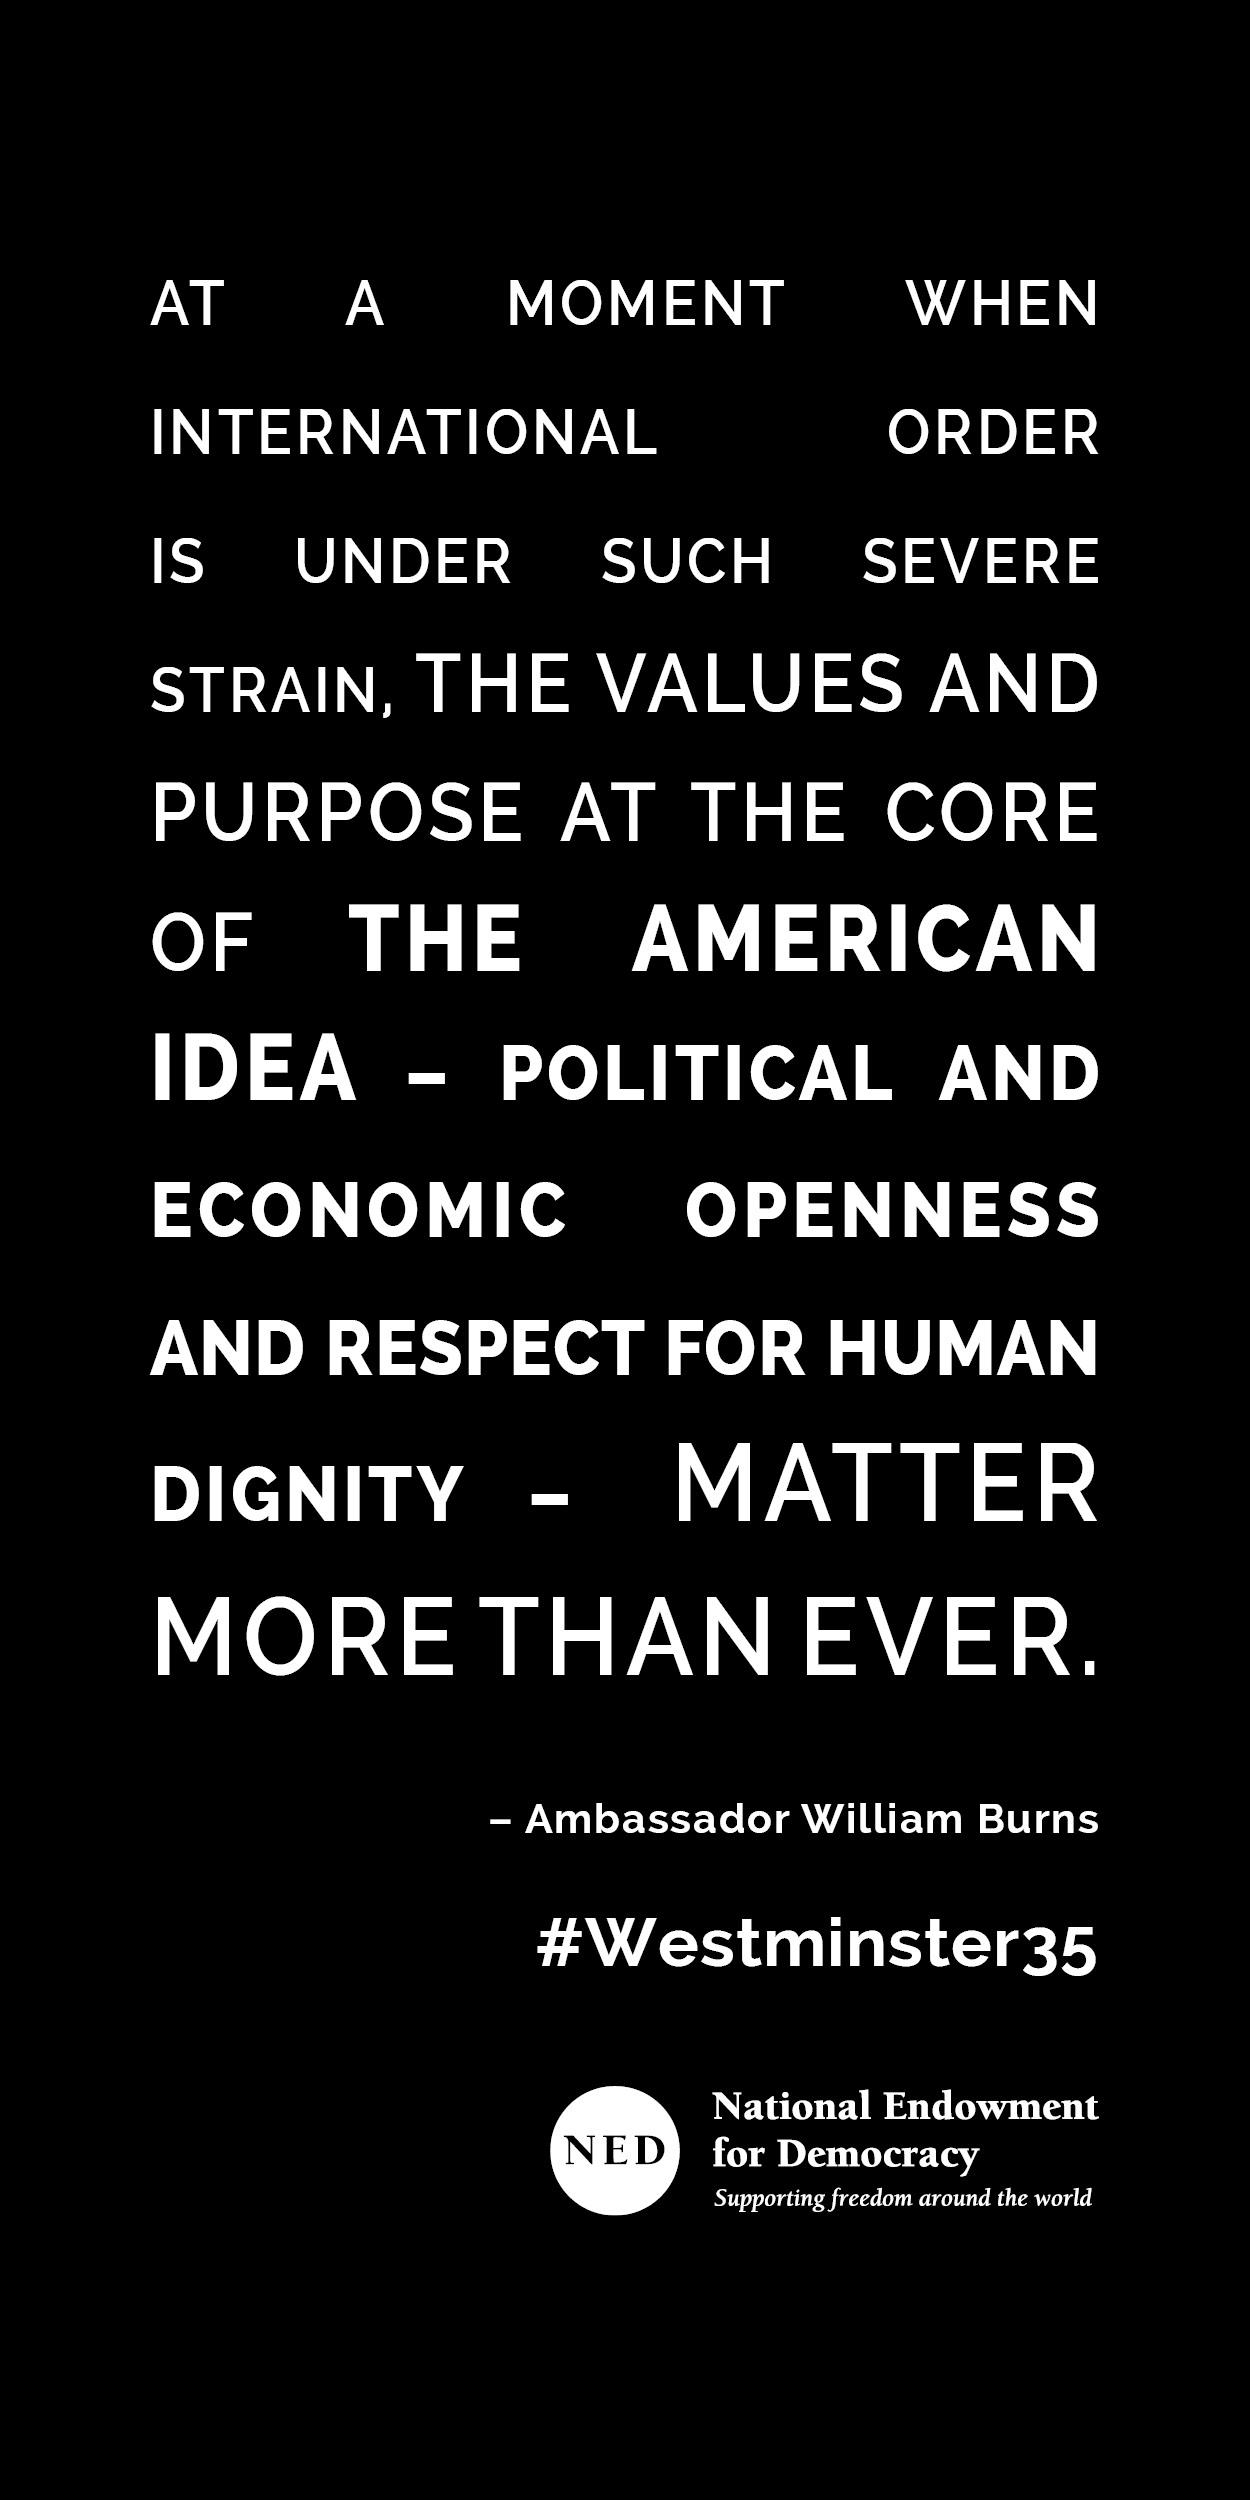 American values matter